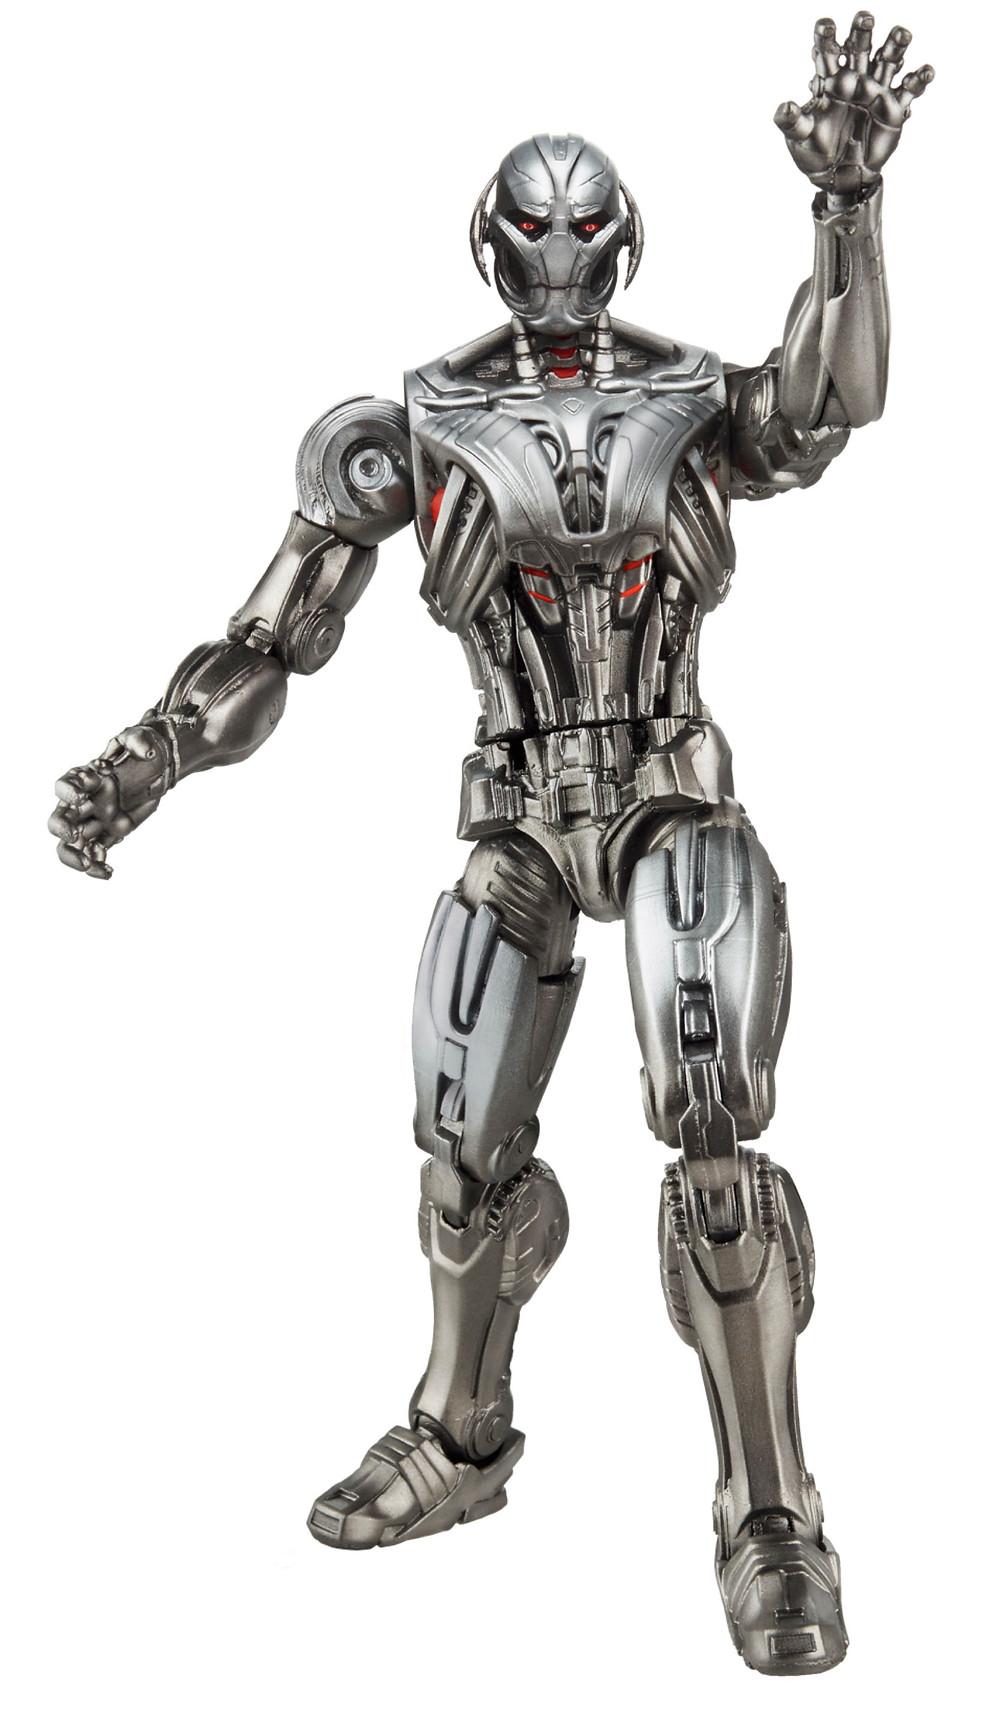 Ant-Man-Legends-Ultron-Build-a-Figure.jpg